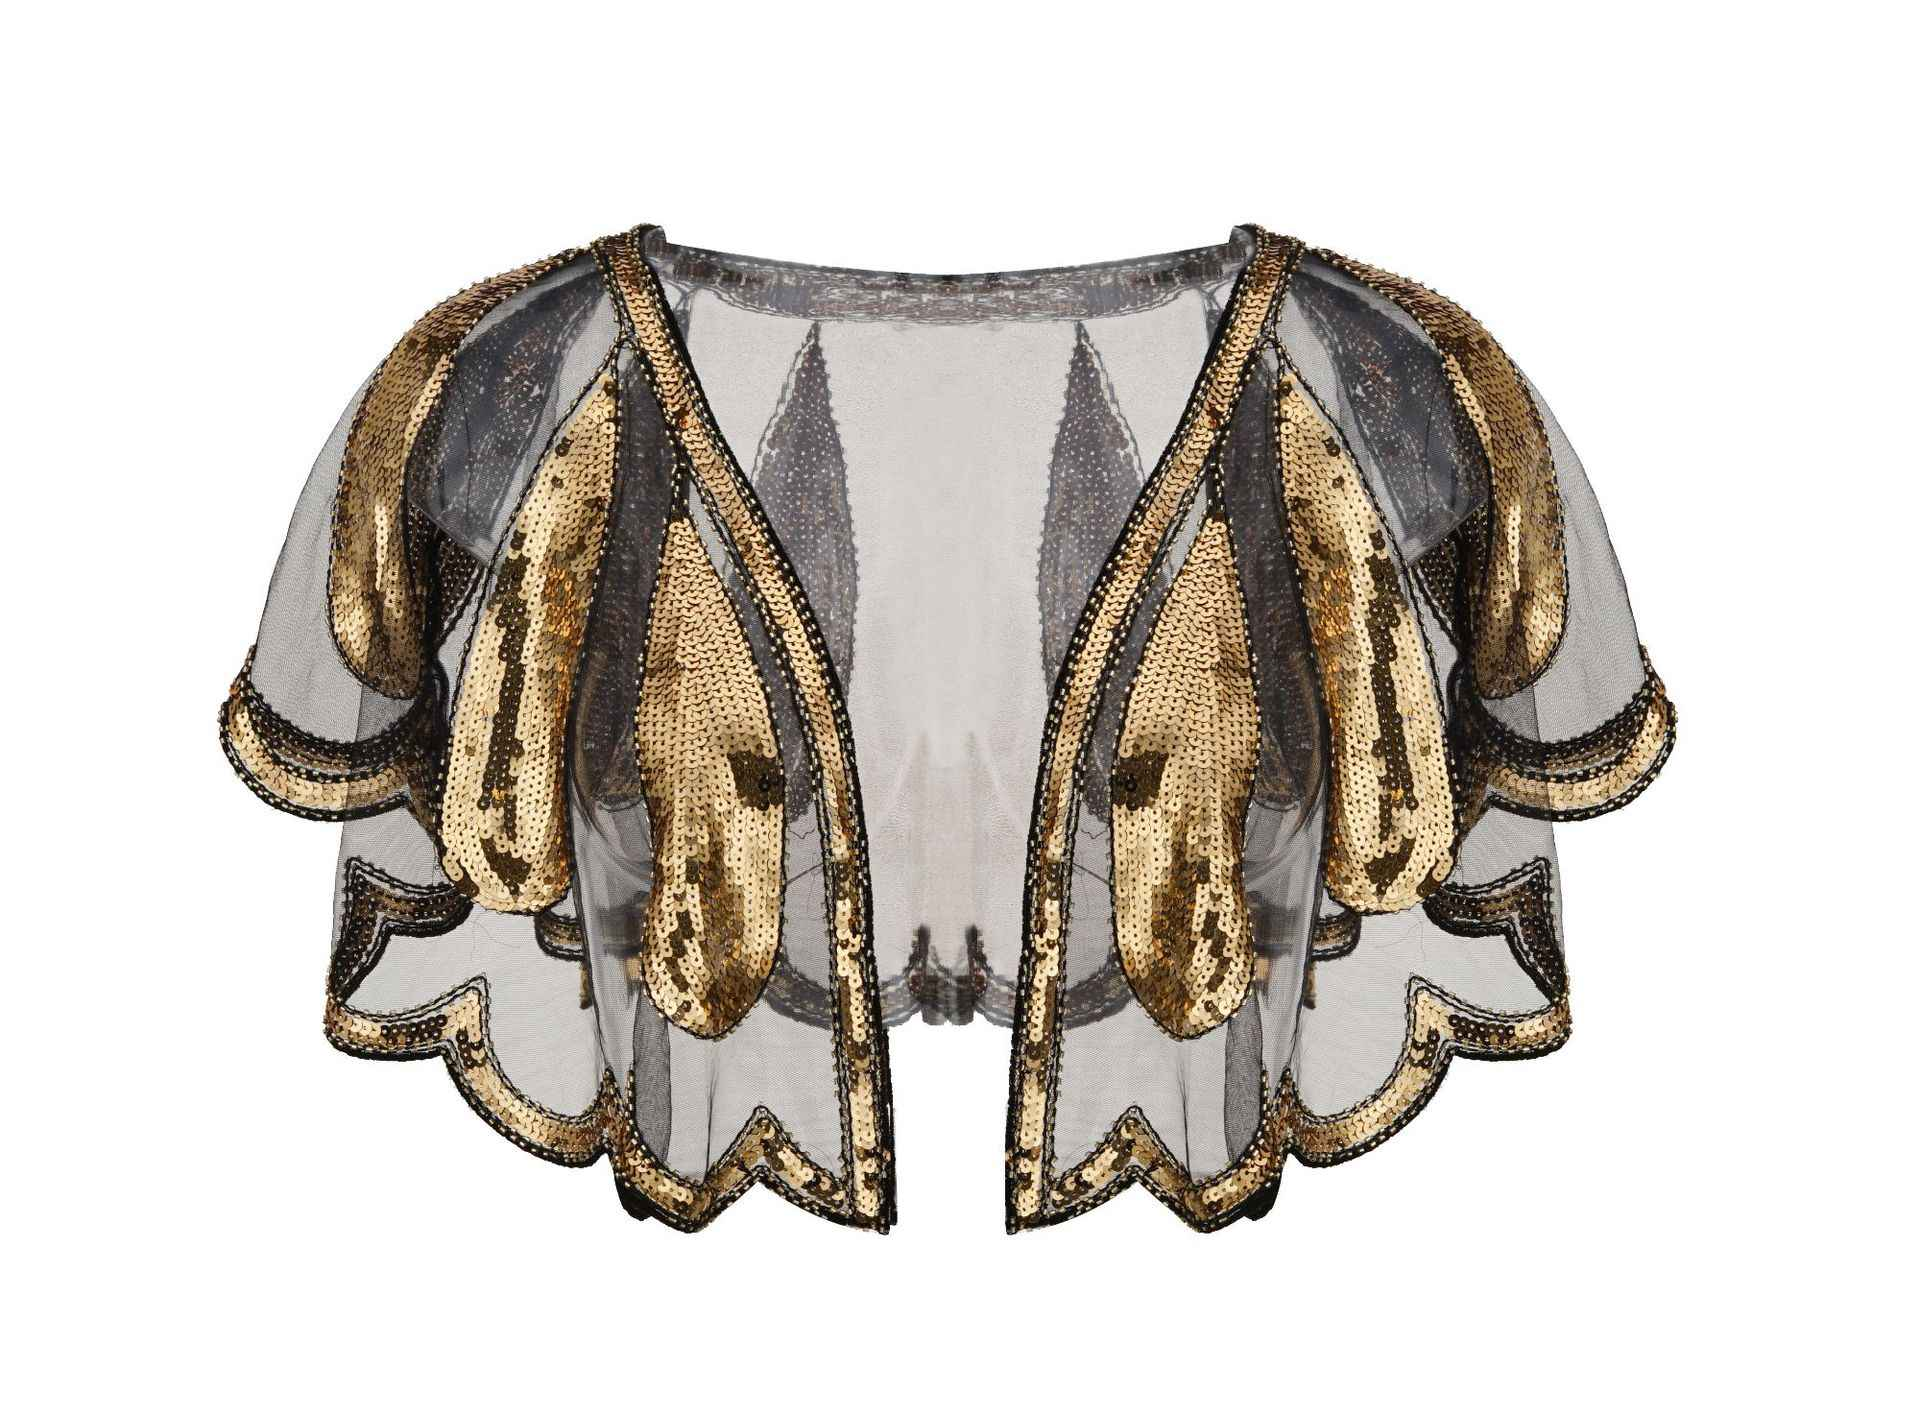 Elegante preto ouro azul vermelho nupcial xale wrap bolero feminino curto cabo lantejoulas sparking casamento jaqueta encolher chaqueta de la boda